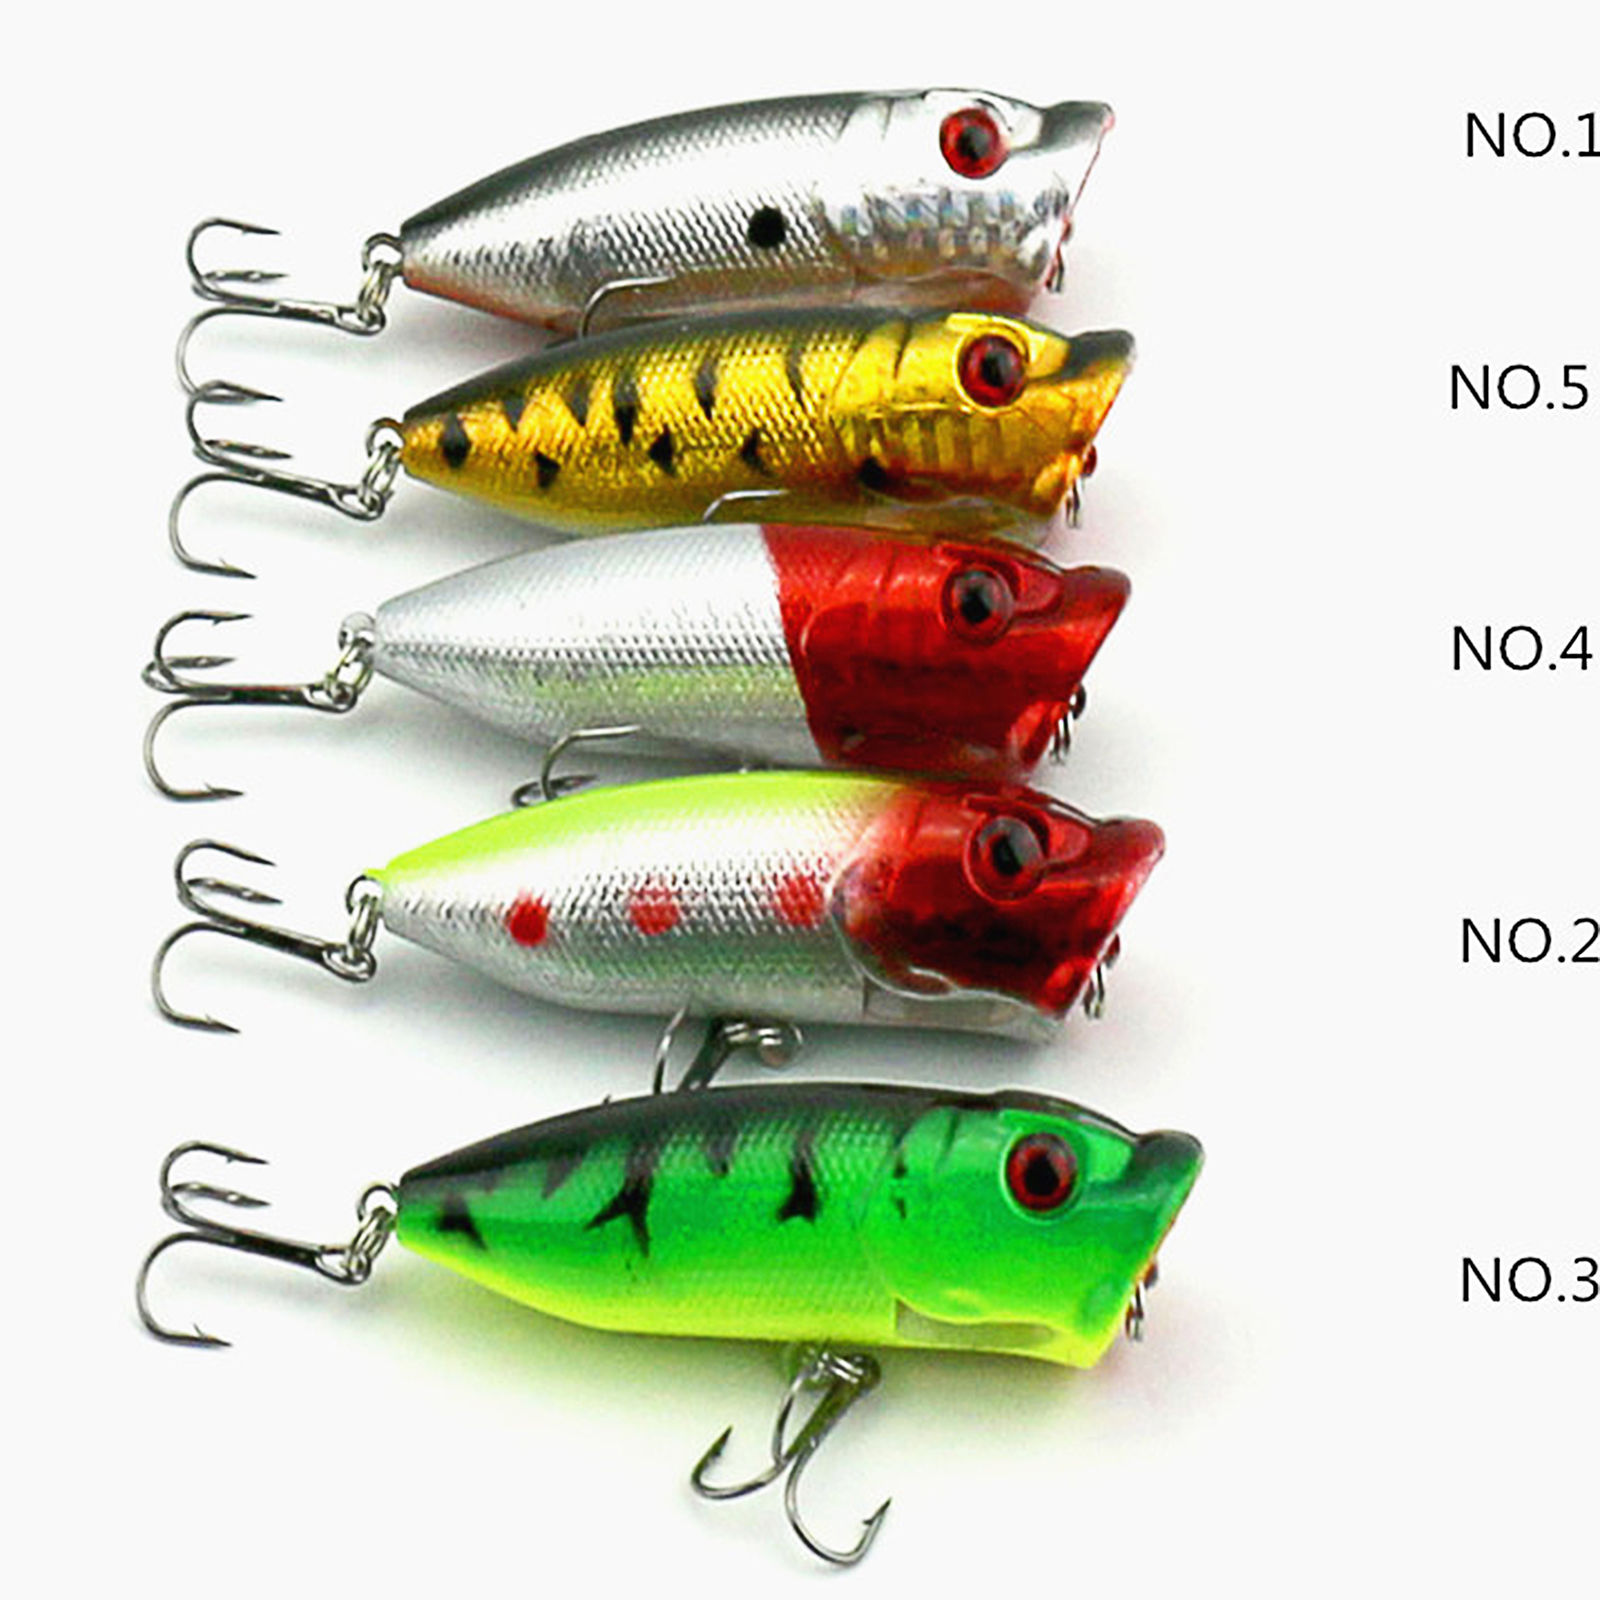 5PCS Lot Topwater Popper Freshwater Fishing Lures Bass Bait hook Tackle EN